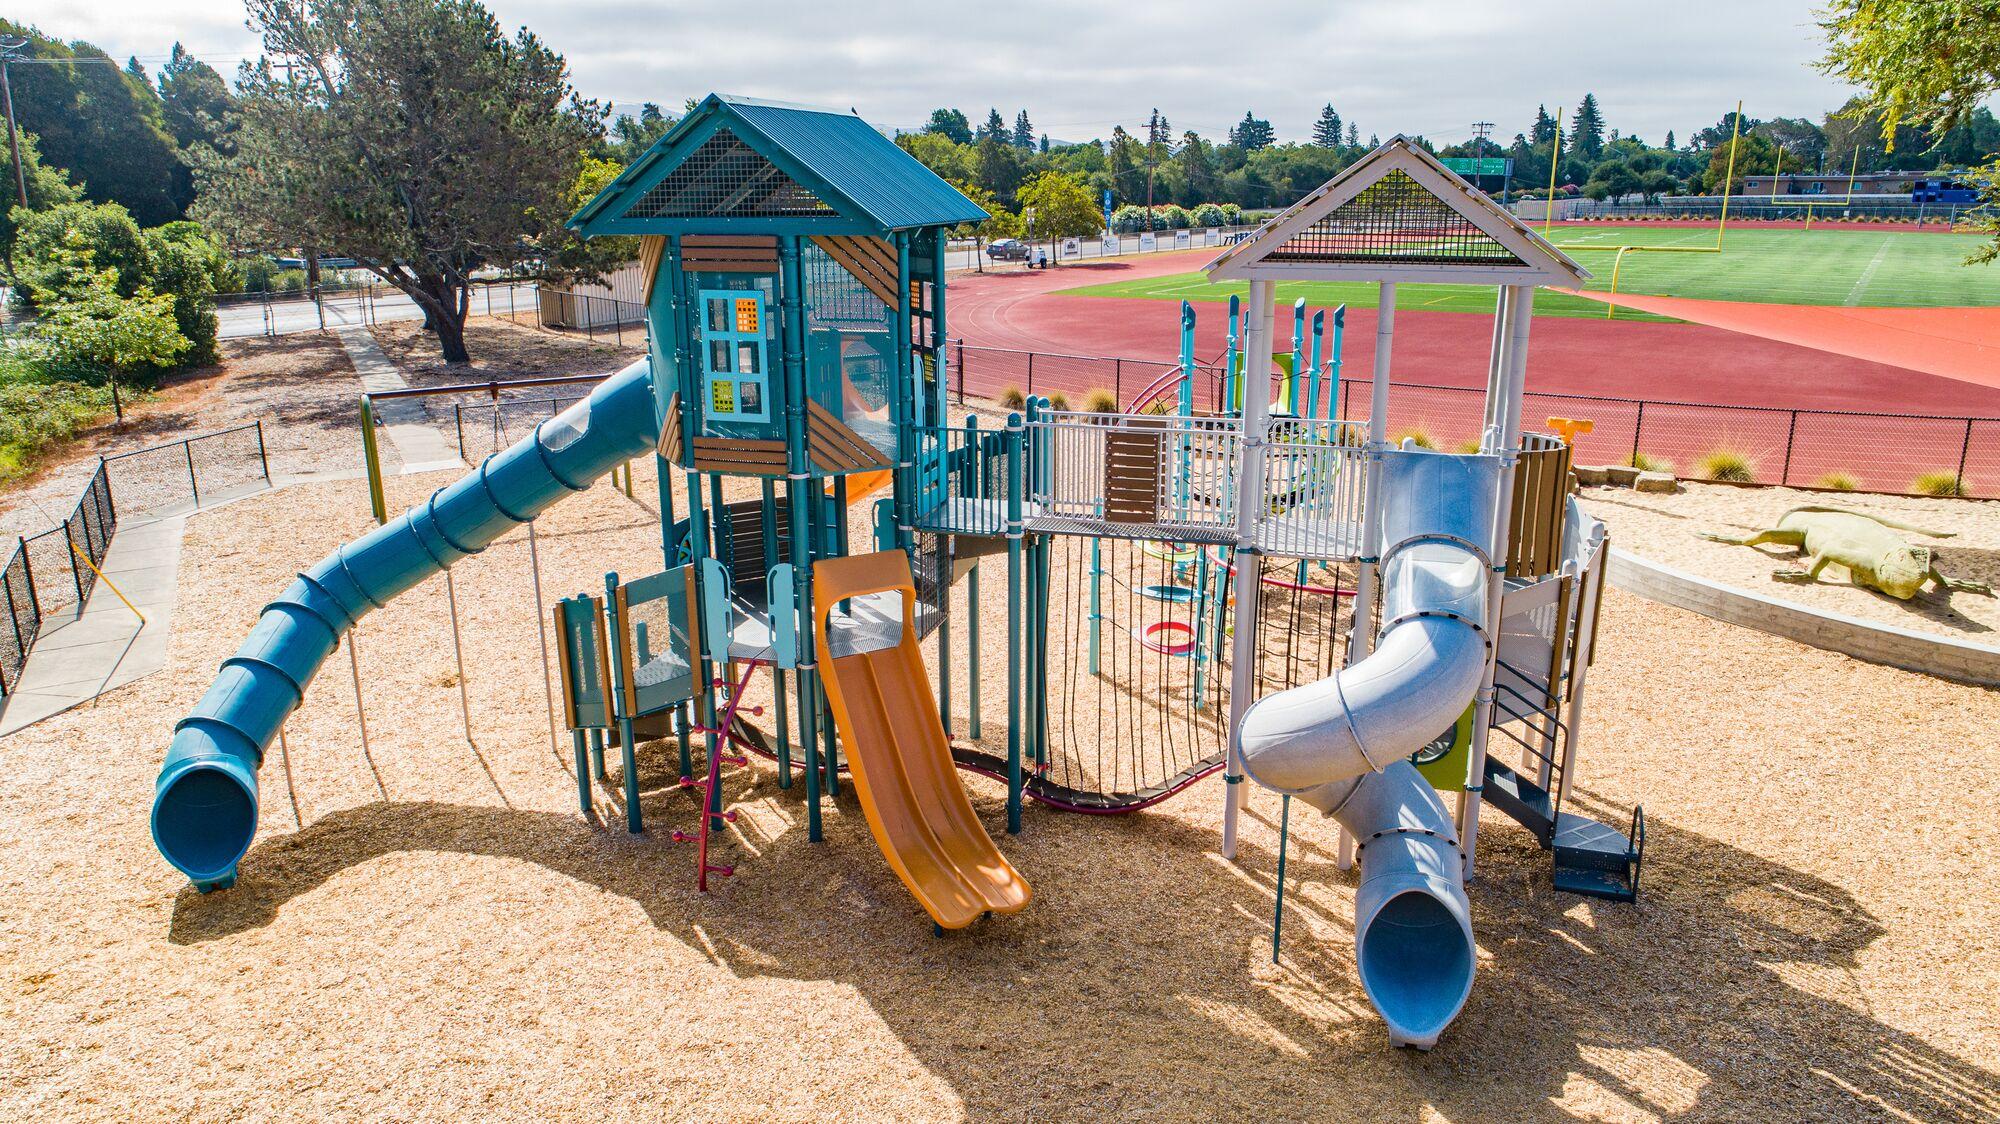 Playground Fantastico, Napa